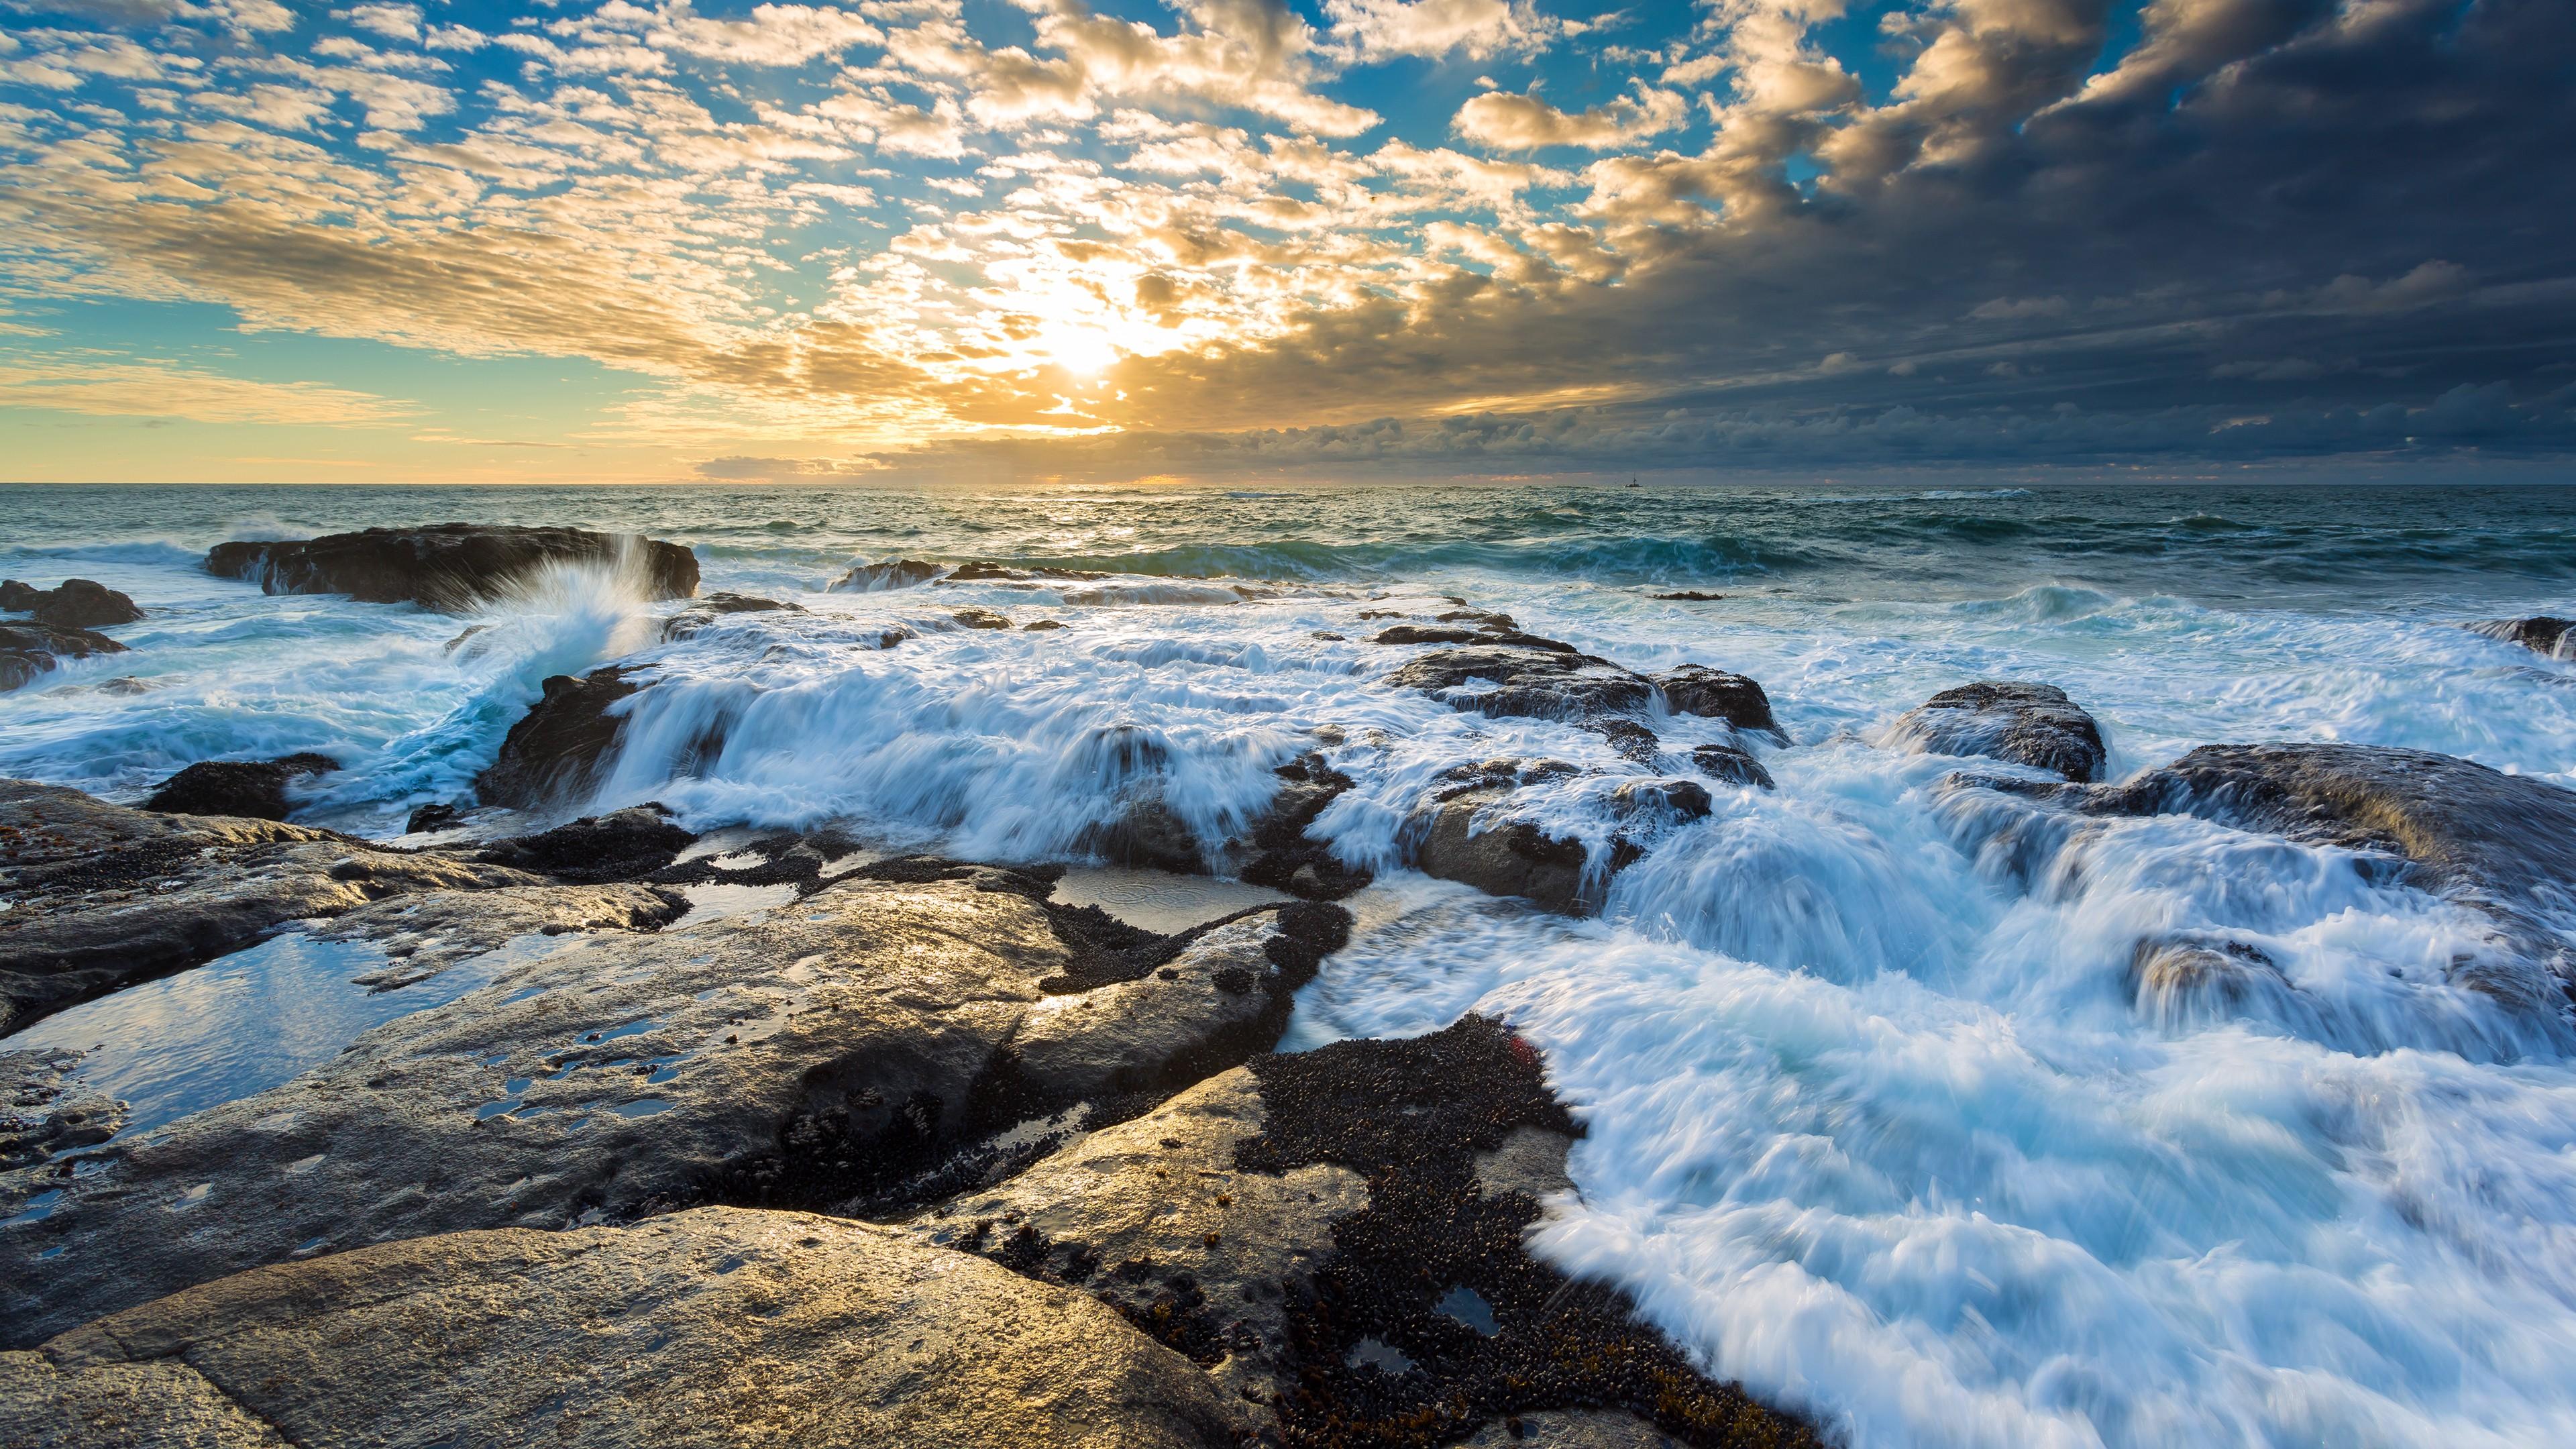 wallpaper clouds 4k hd wallpaper beach sunrise ocean